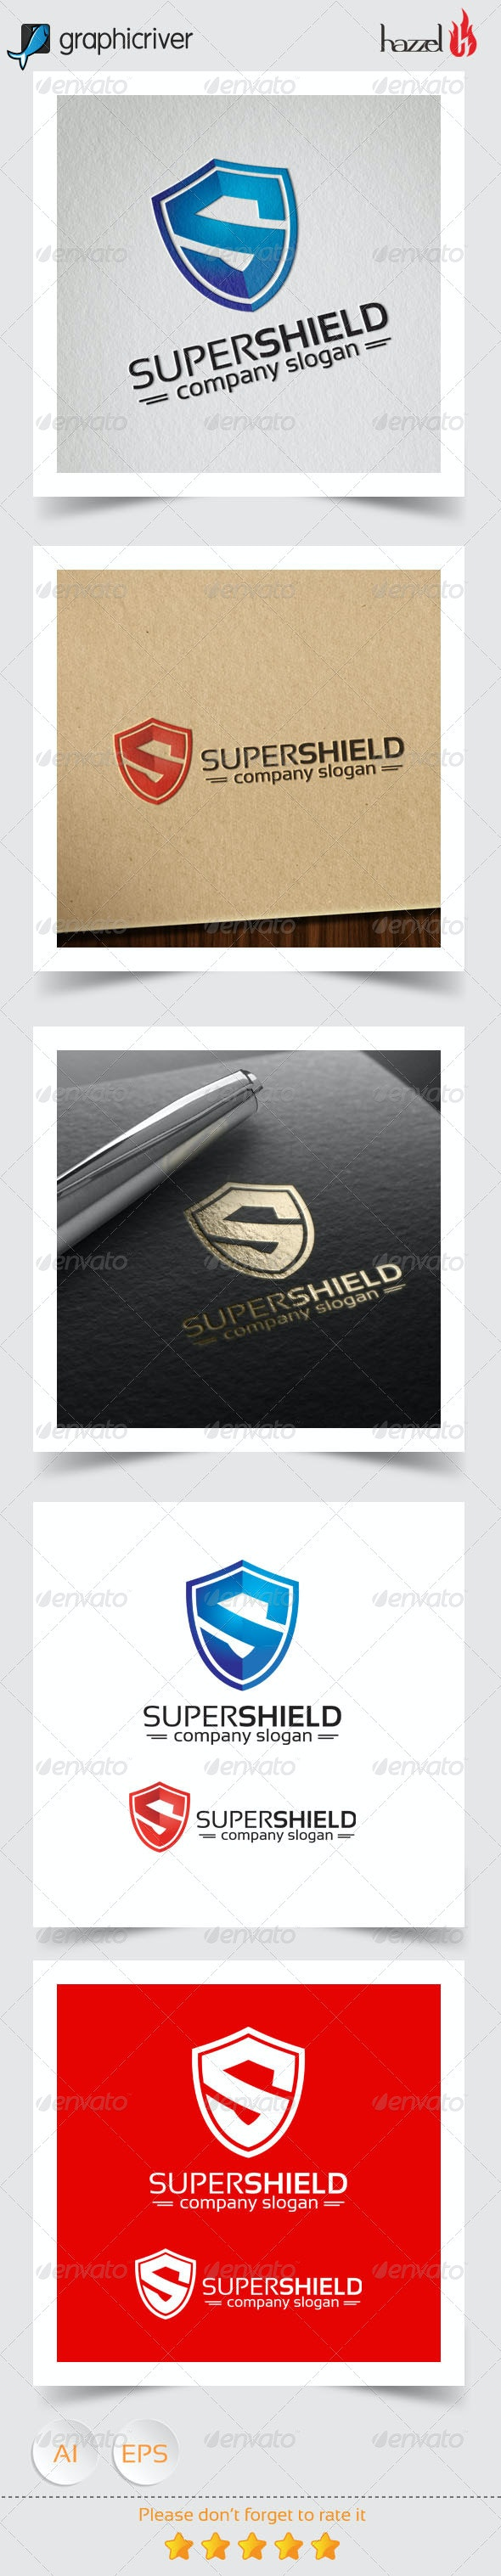 Super Shield - Letter S Logo - Letters Logo Templates